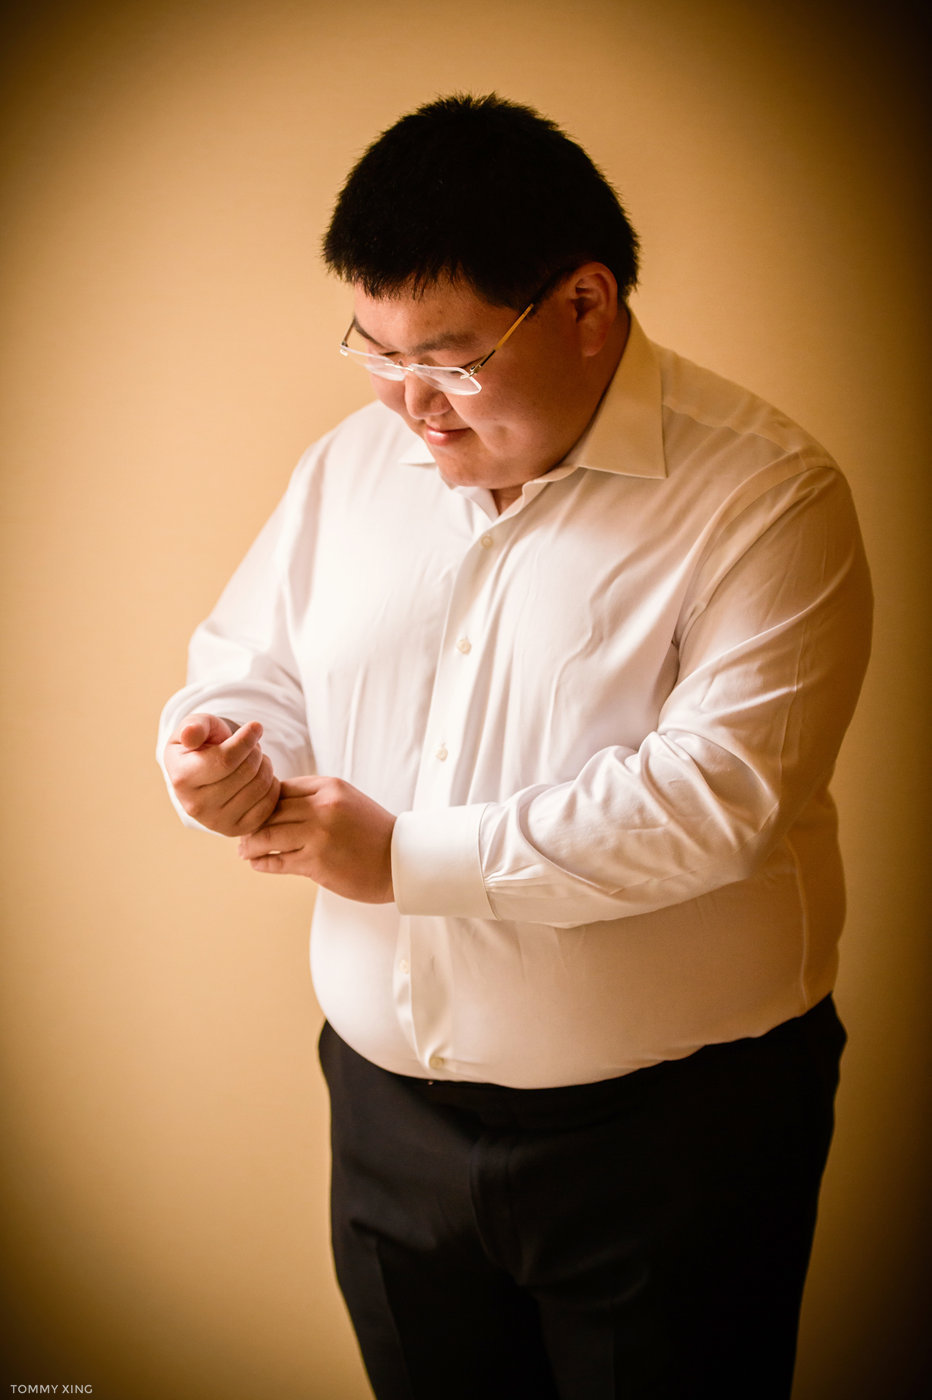 STANFORD MEMORIAL CHURCH WEDDING - Wenjie & Chengcheng - SAN FRANCISCO BAY AREA 斯坦福教堂婚礼跟拍 - 洛杉矶婚礼婚纱照摄影师 Tommy Xing Photography023.jpg